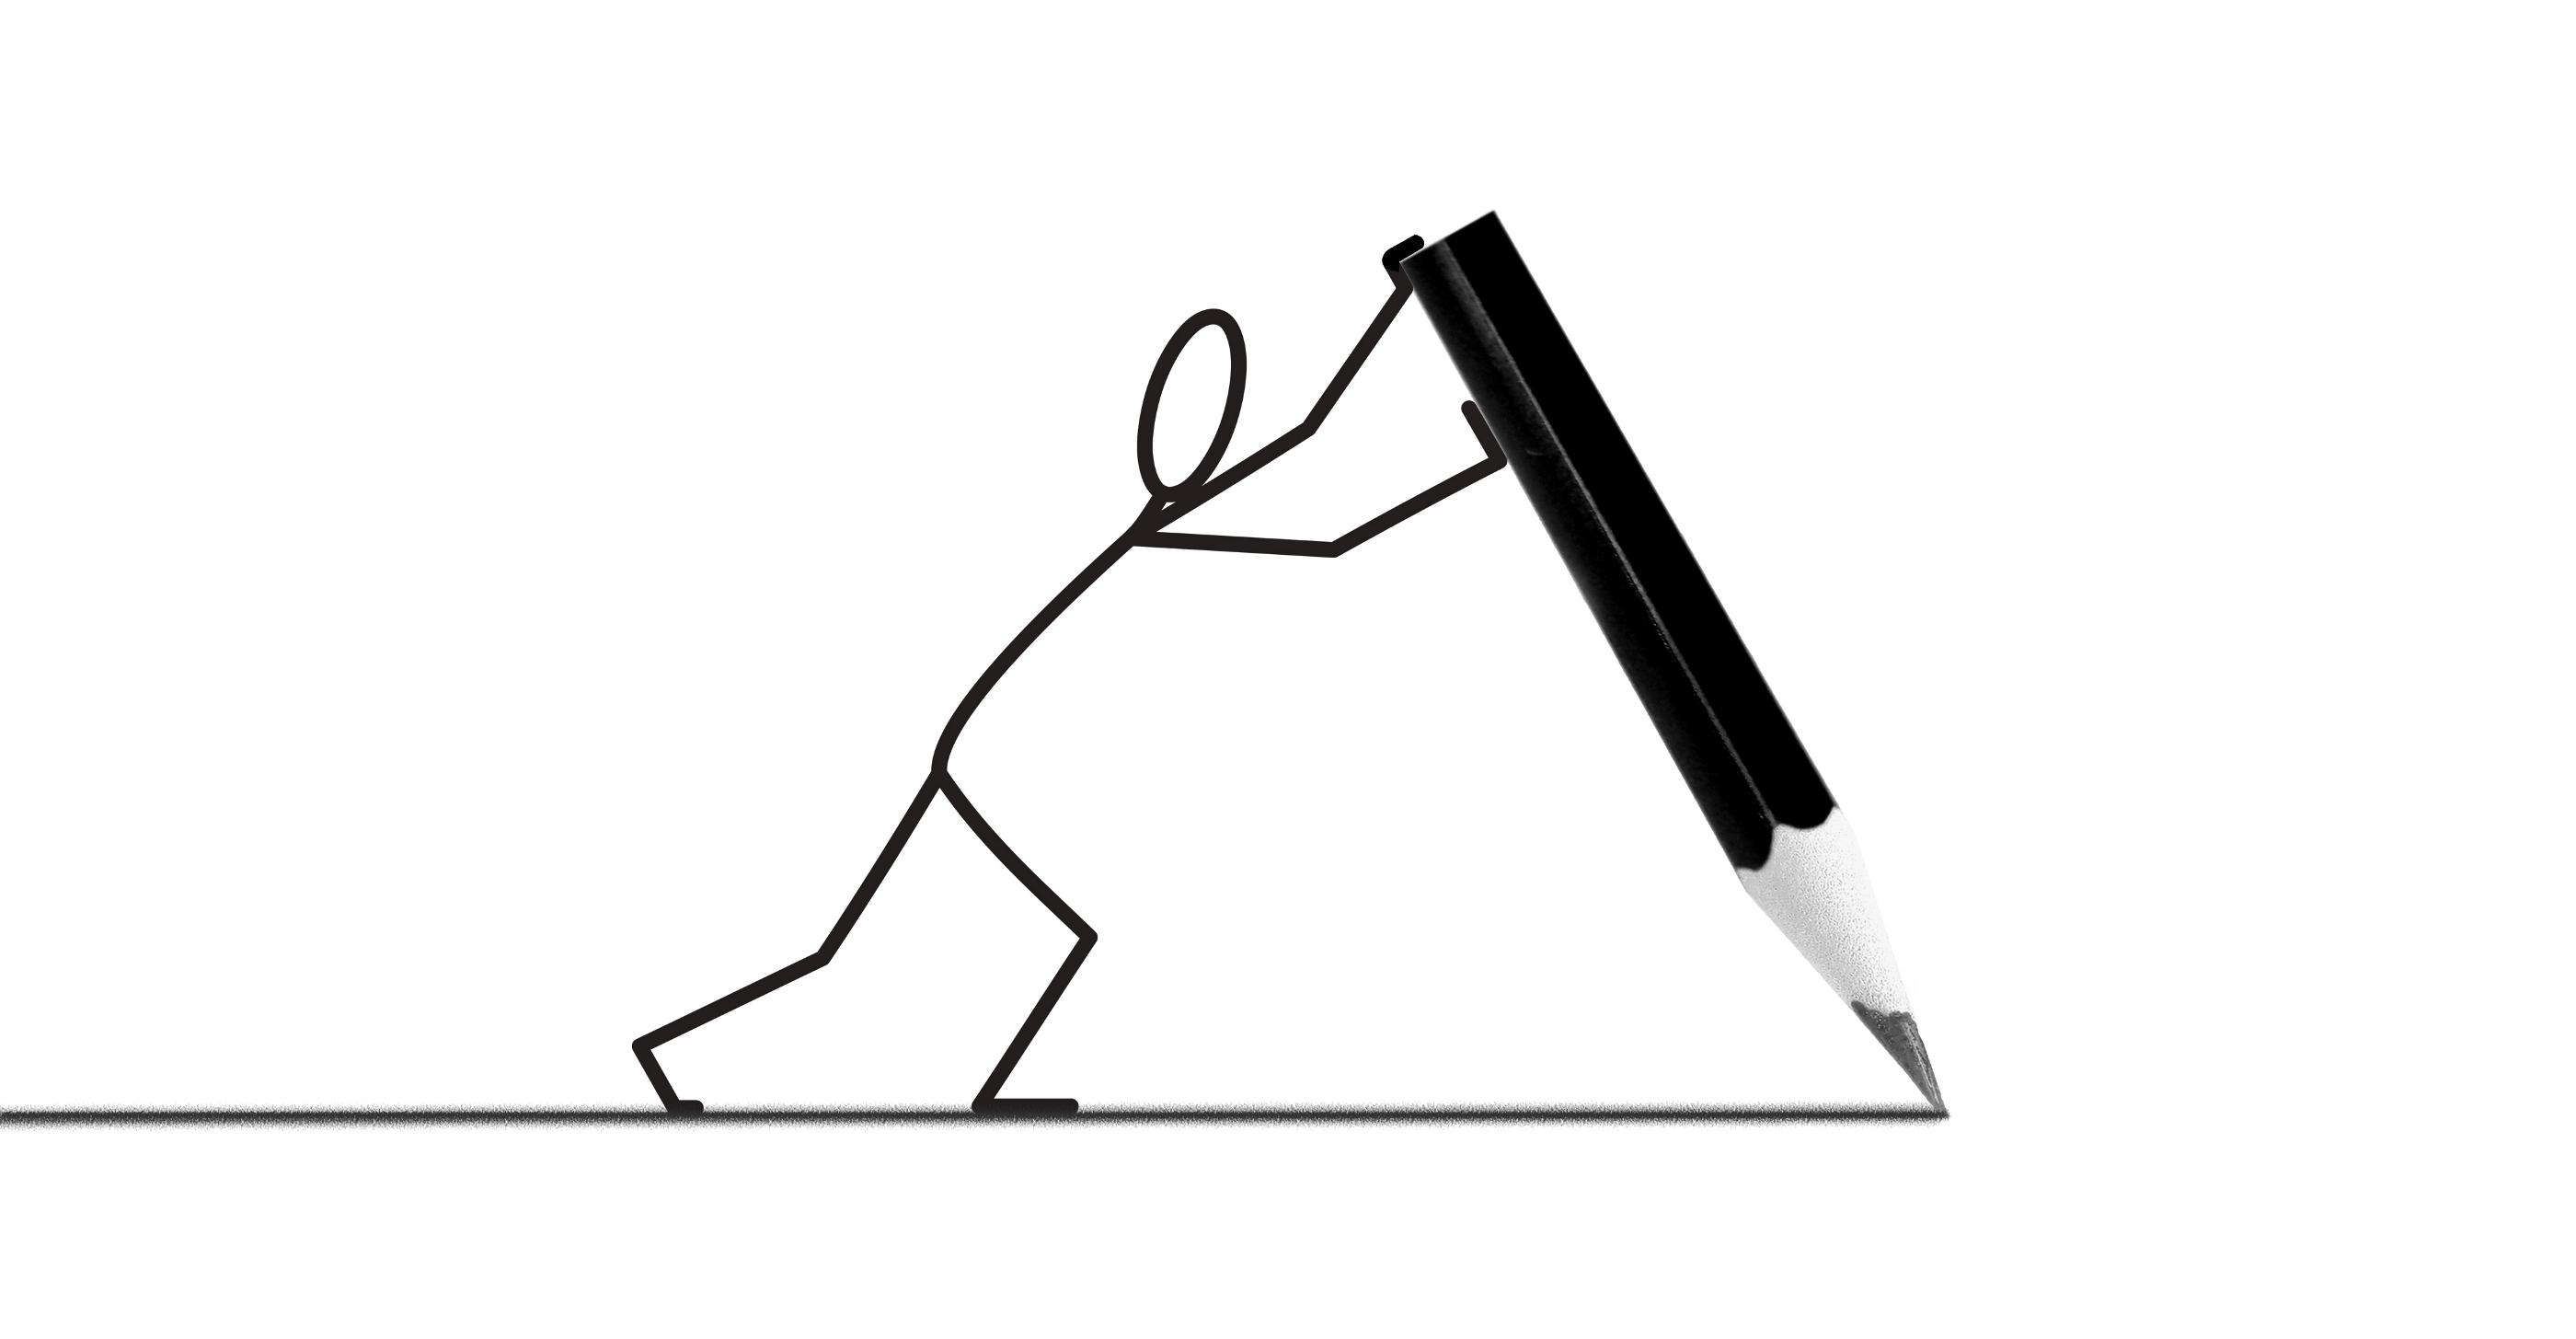 Pencil Writing Clip Art   Clipart Panda - Free Clipart Images